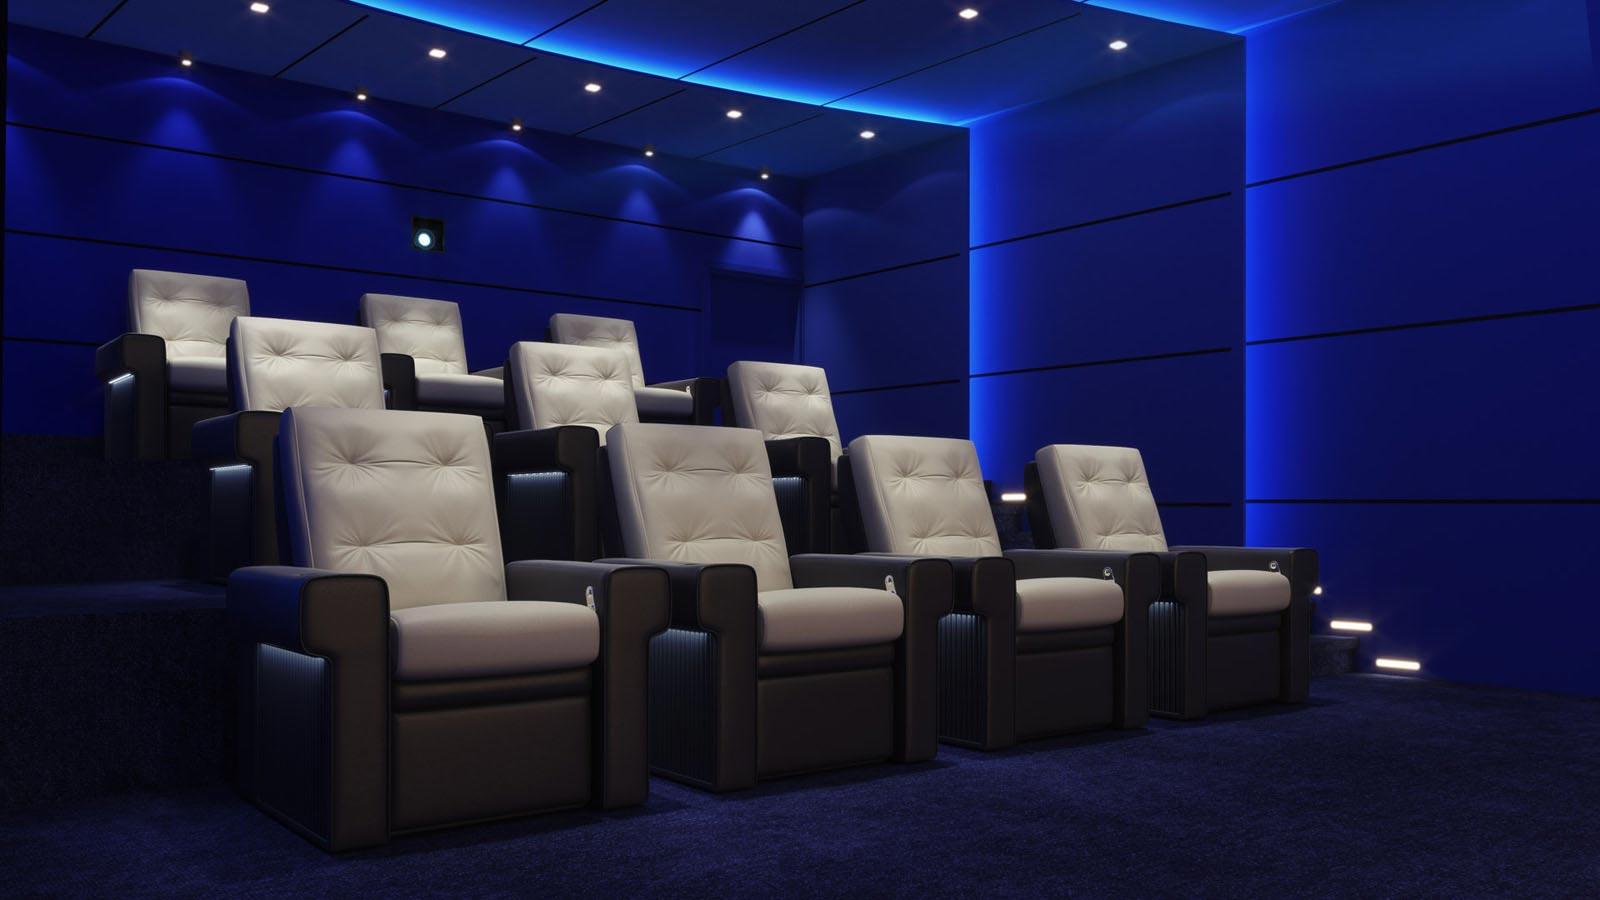 Cinema room full of chairs